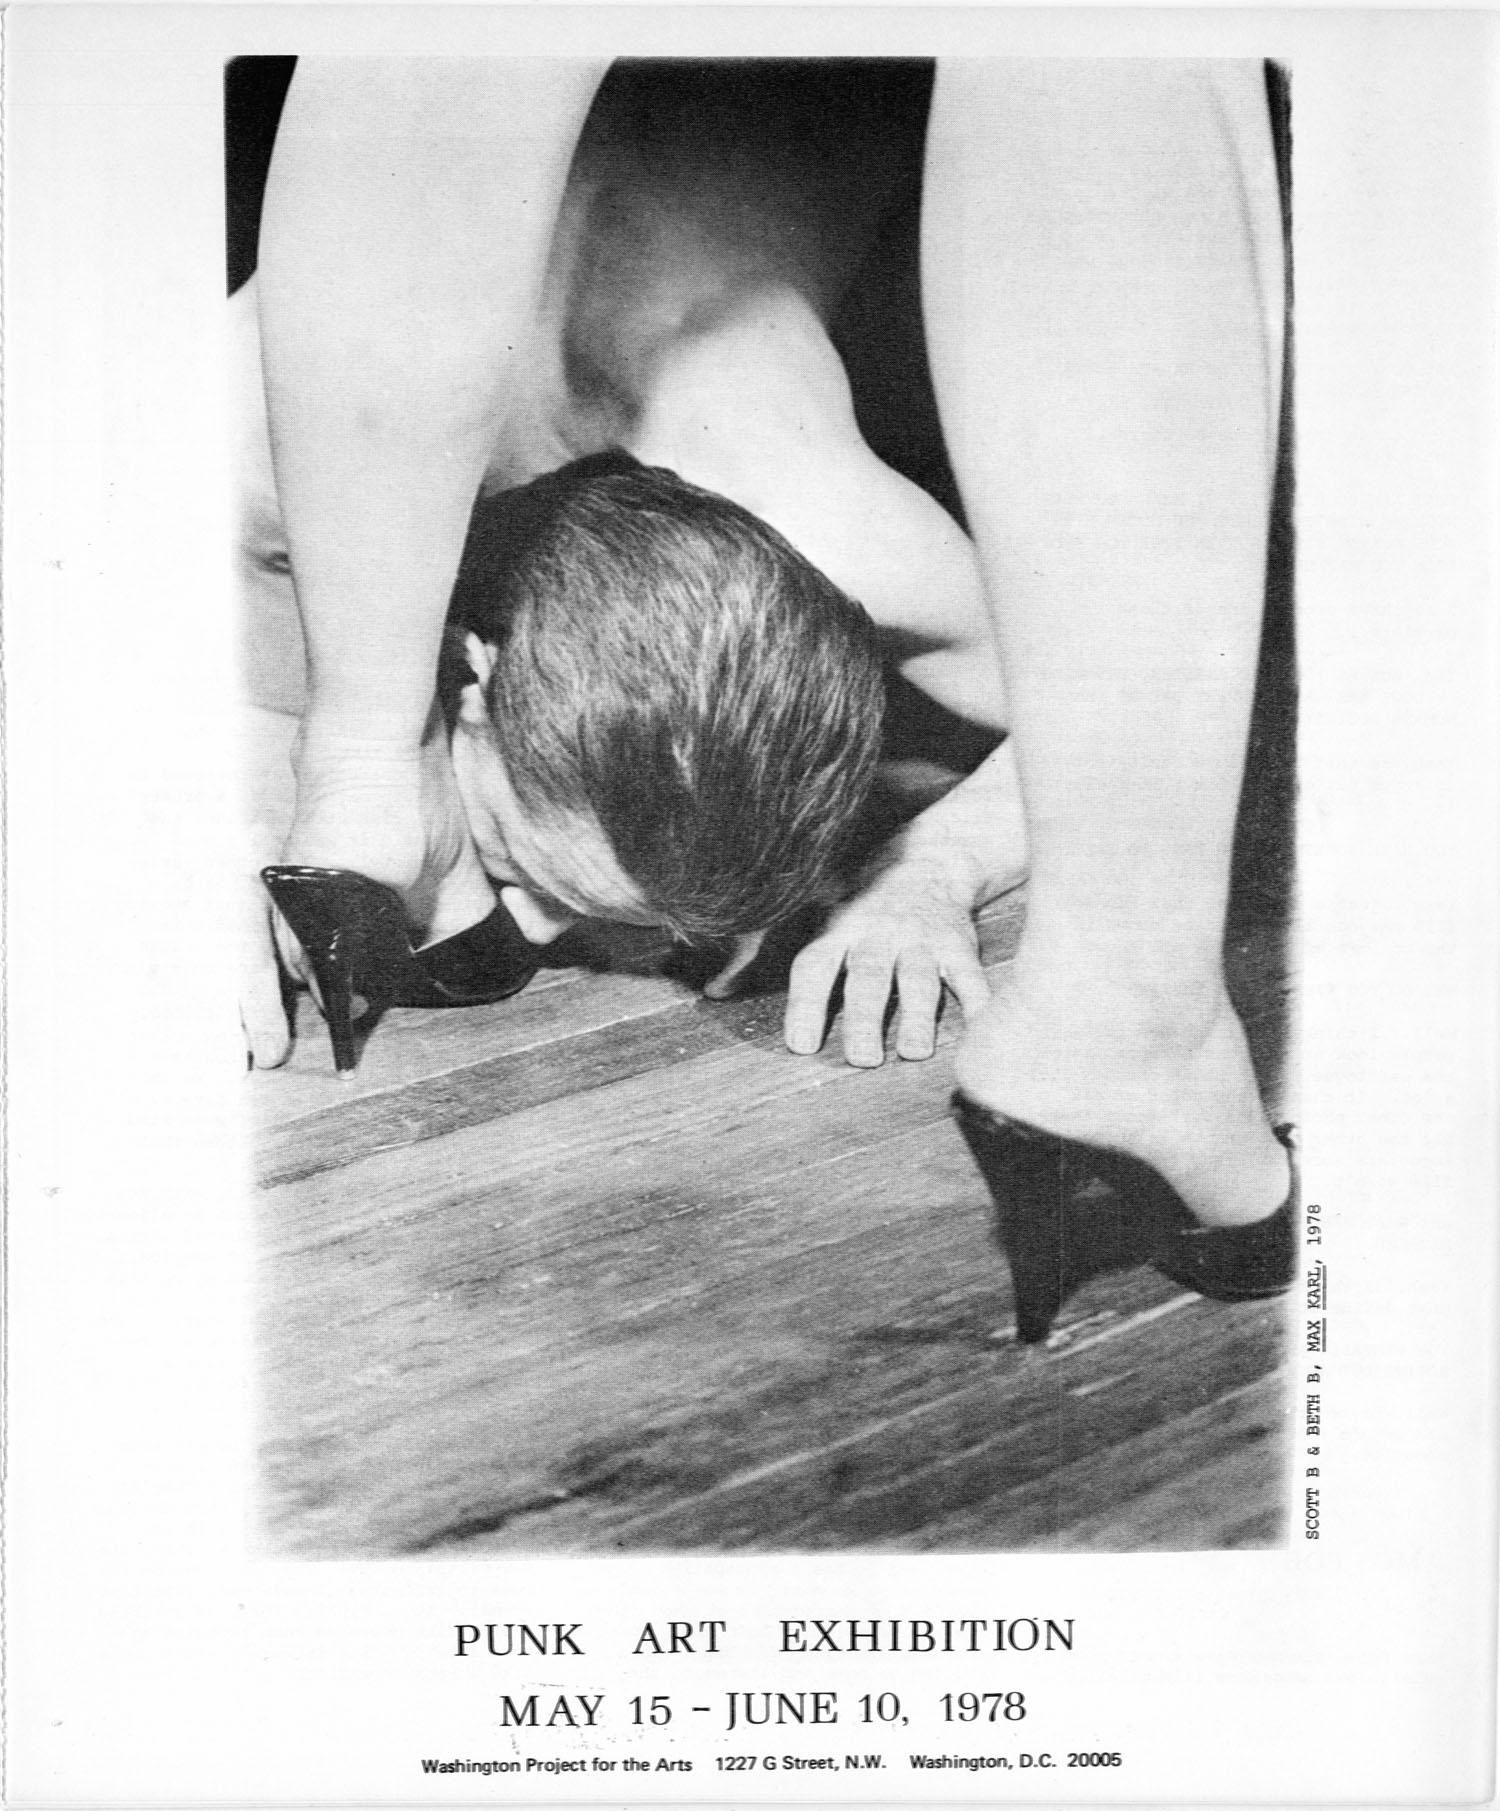 Back cover: Scott B & Beth B, Max Karl, 1978